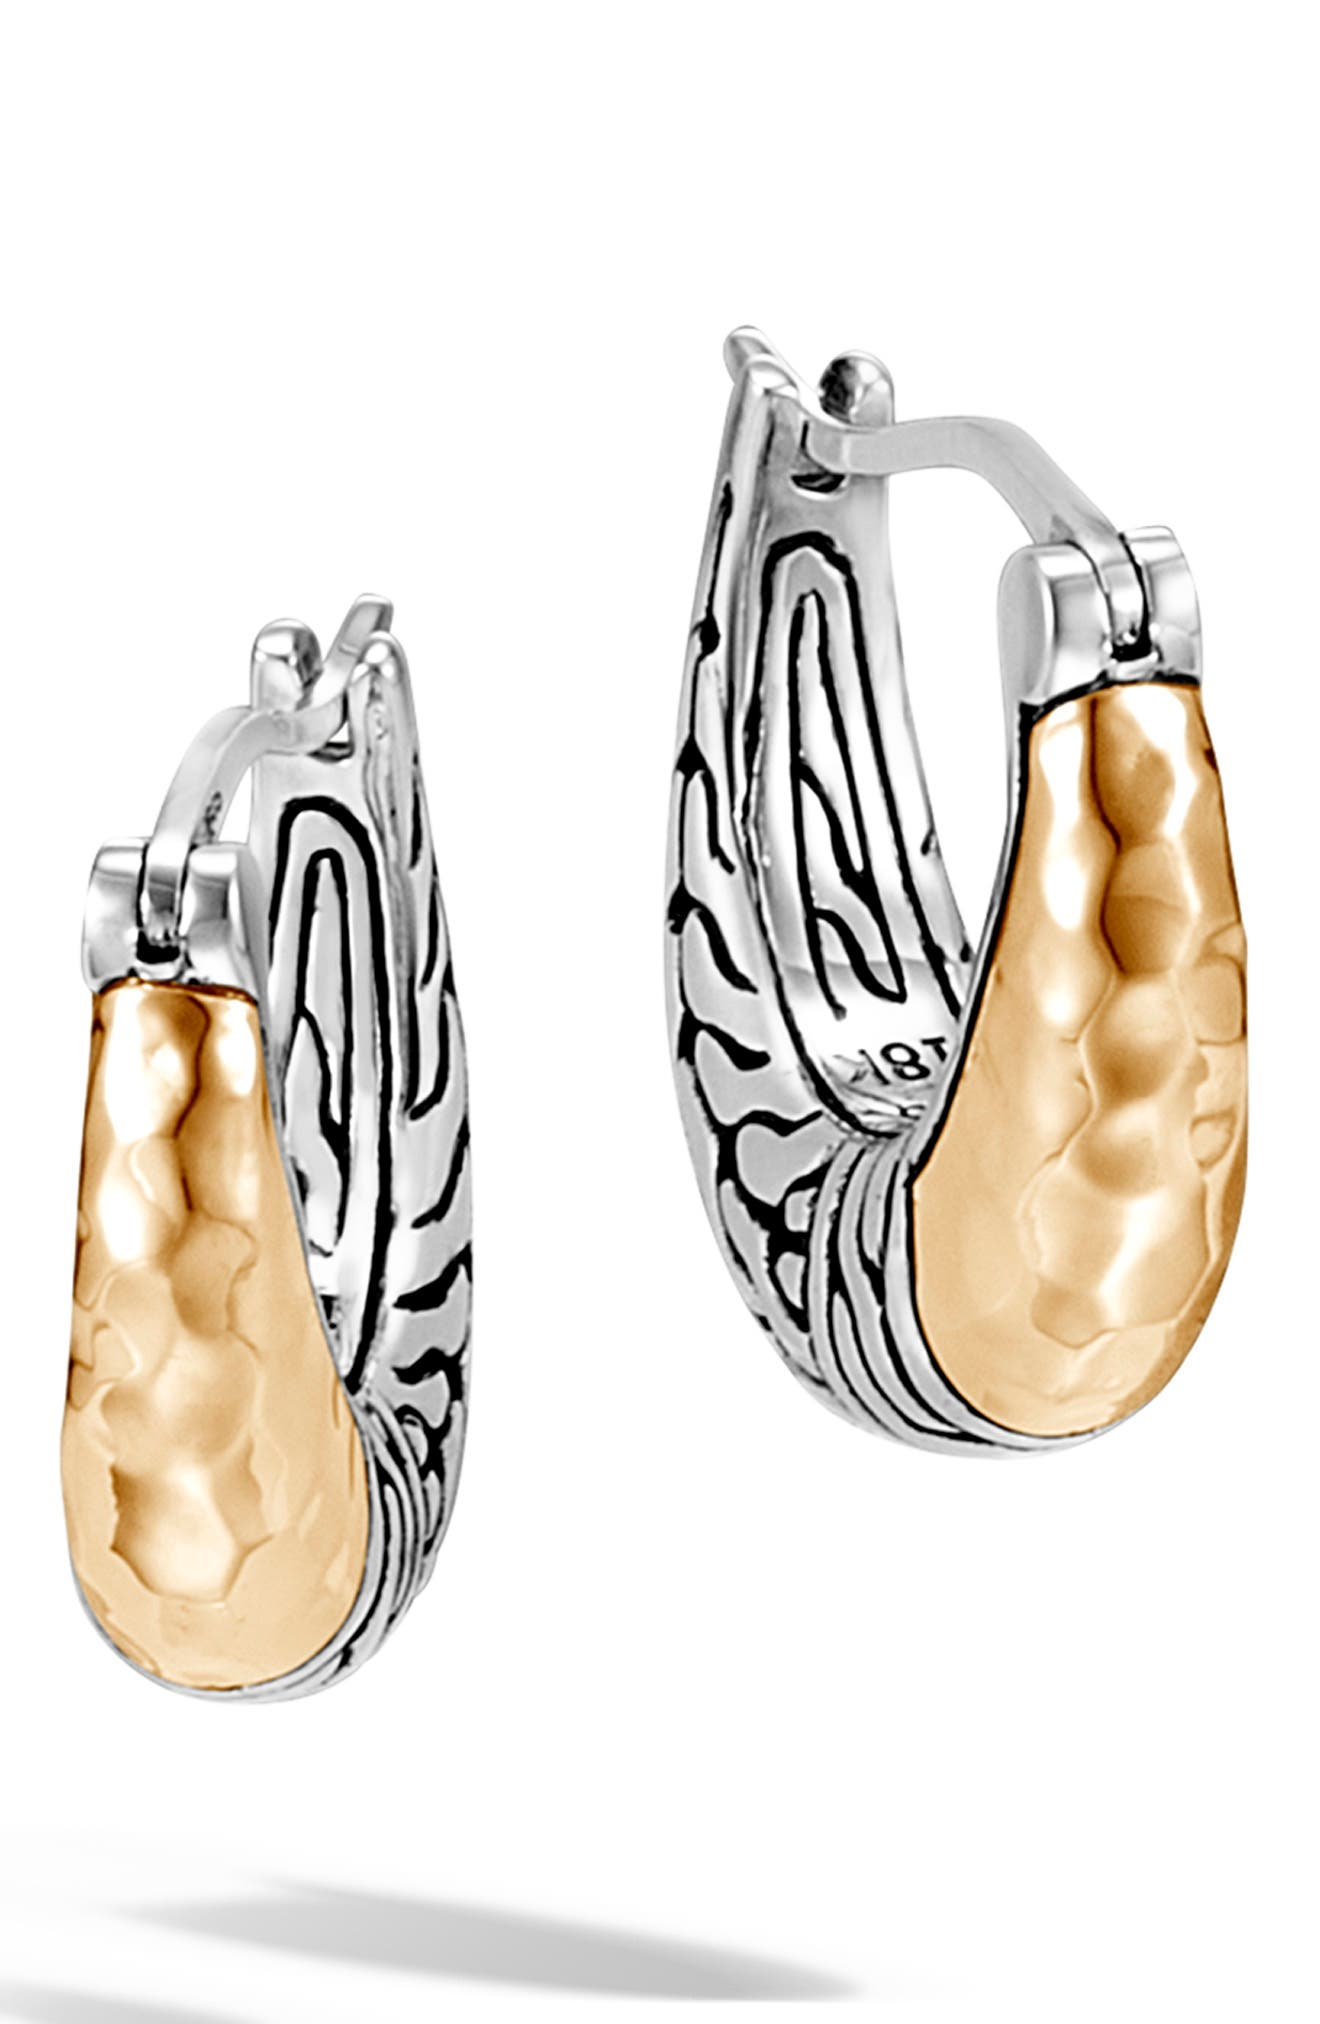 JOHN HARDY, Classic Chain Small Hoop Earrings, Main thumbnail 1, color, SILVER/ GOLD